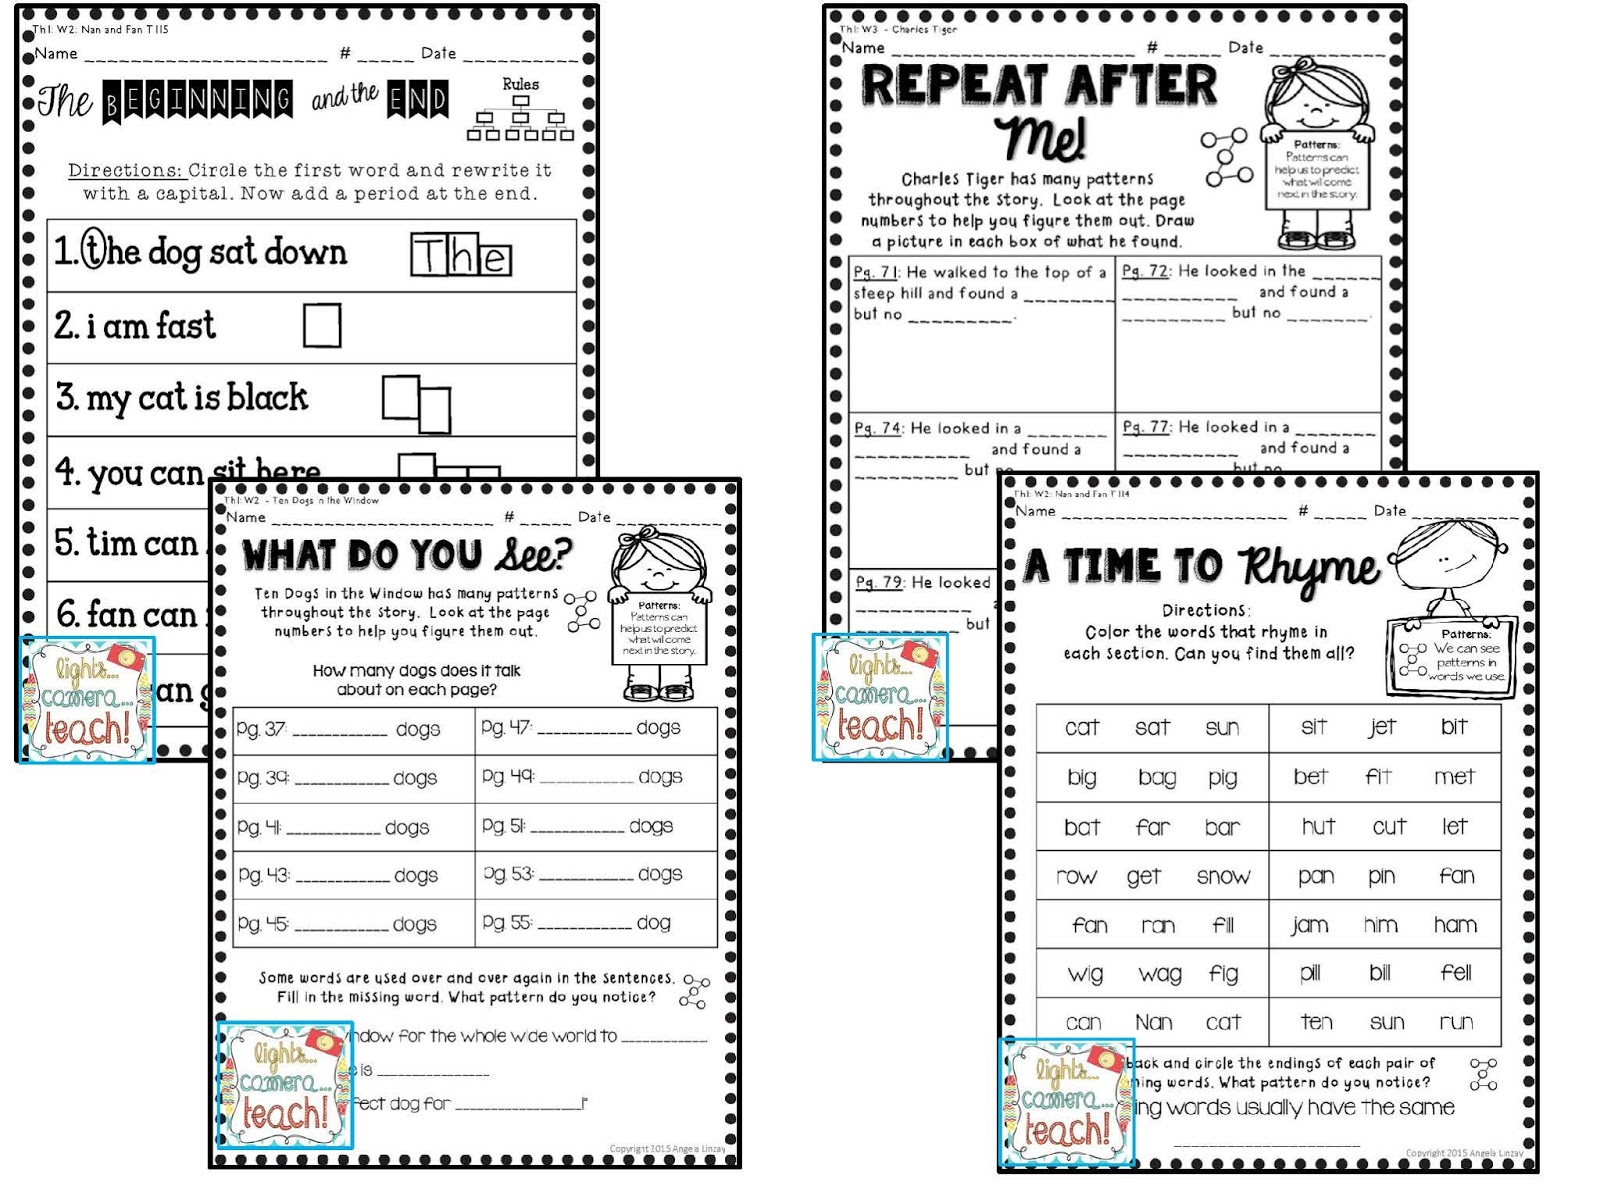 Houghton Mifflin Worksheets Grade 8 Math   Printable Worksheets and  Activities for Teachers [ 1200 x 1600 Pixel ]